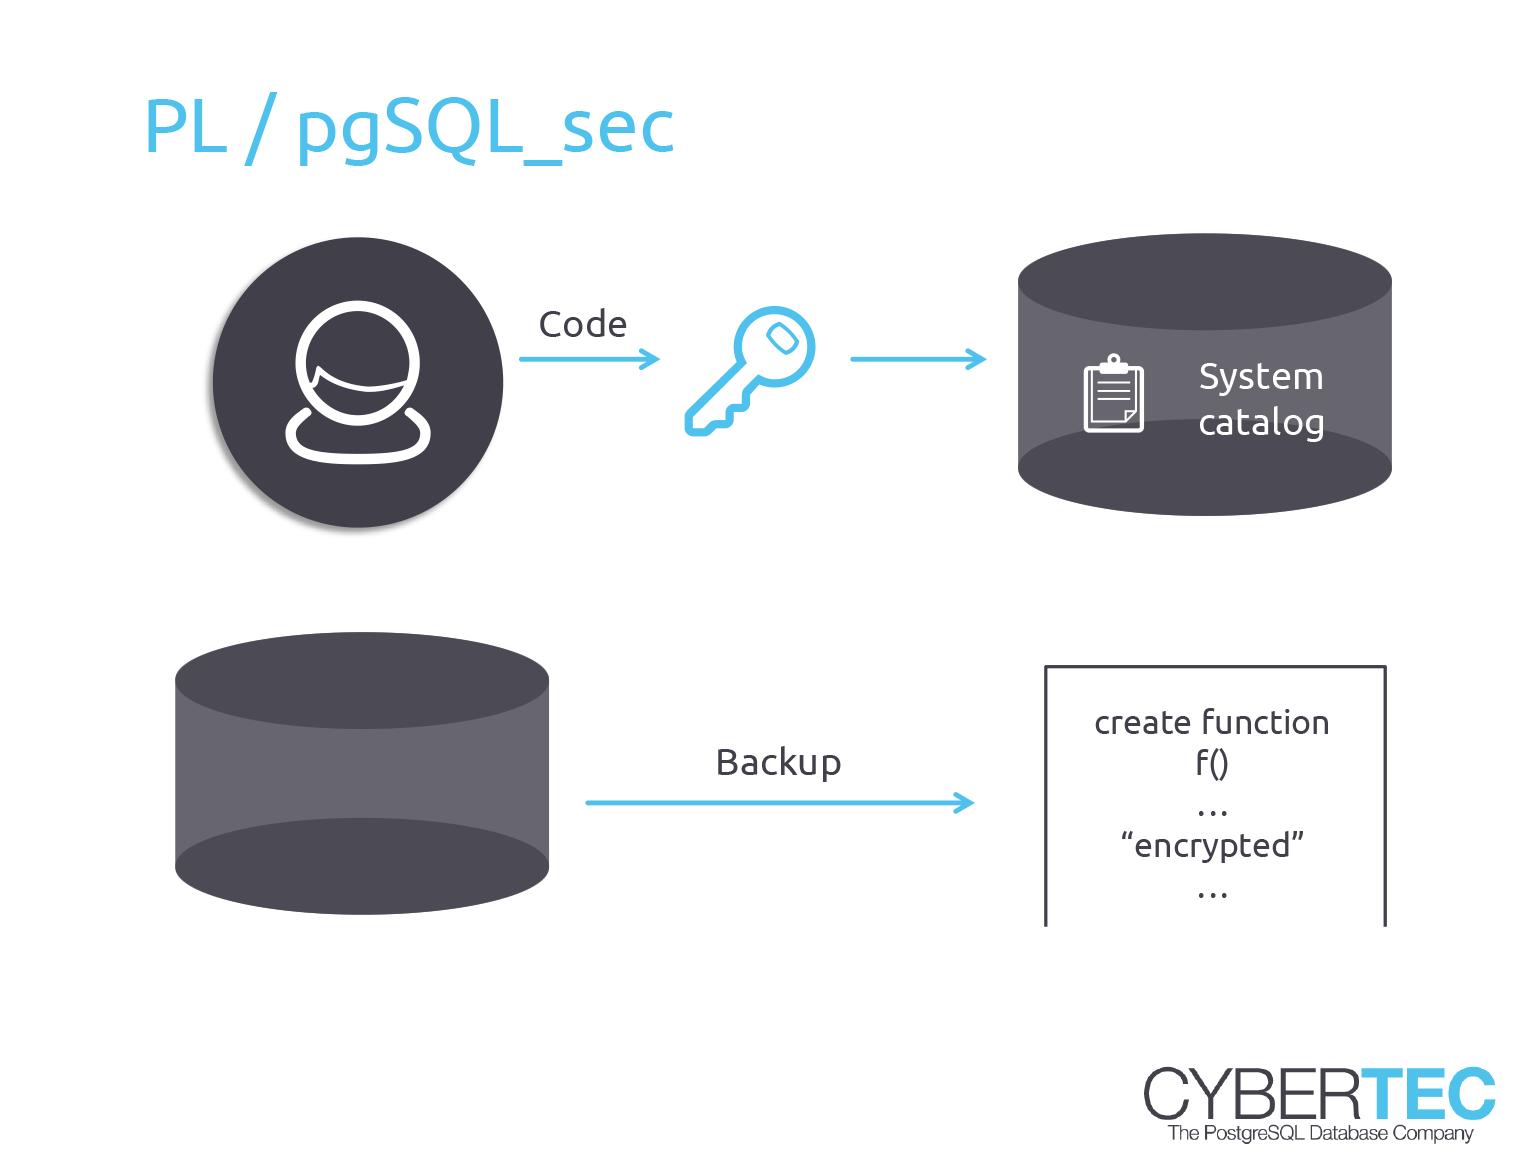 pl_pgSQL_sec - Encrypt Source Code